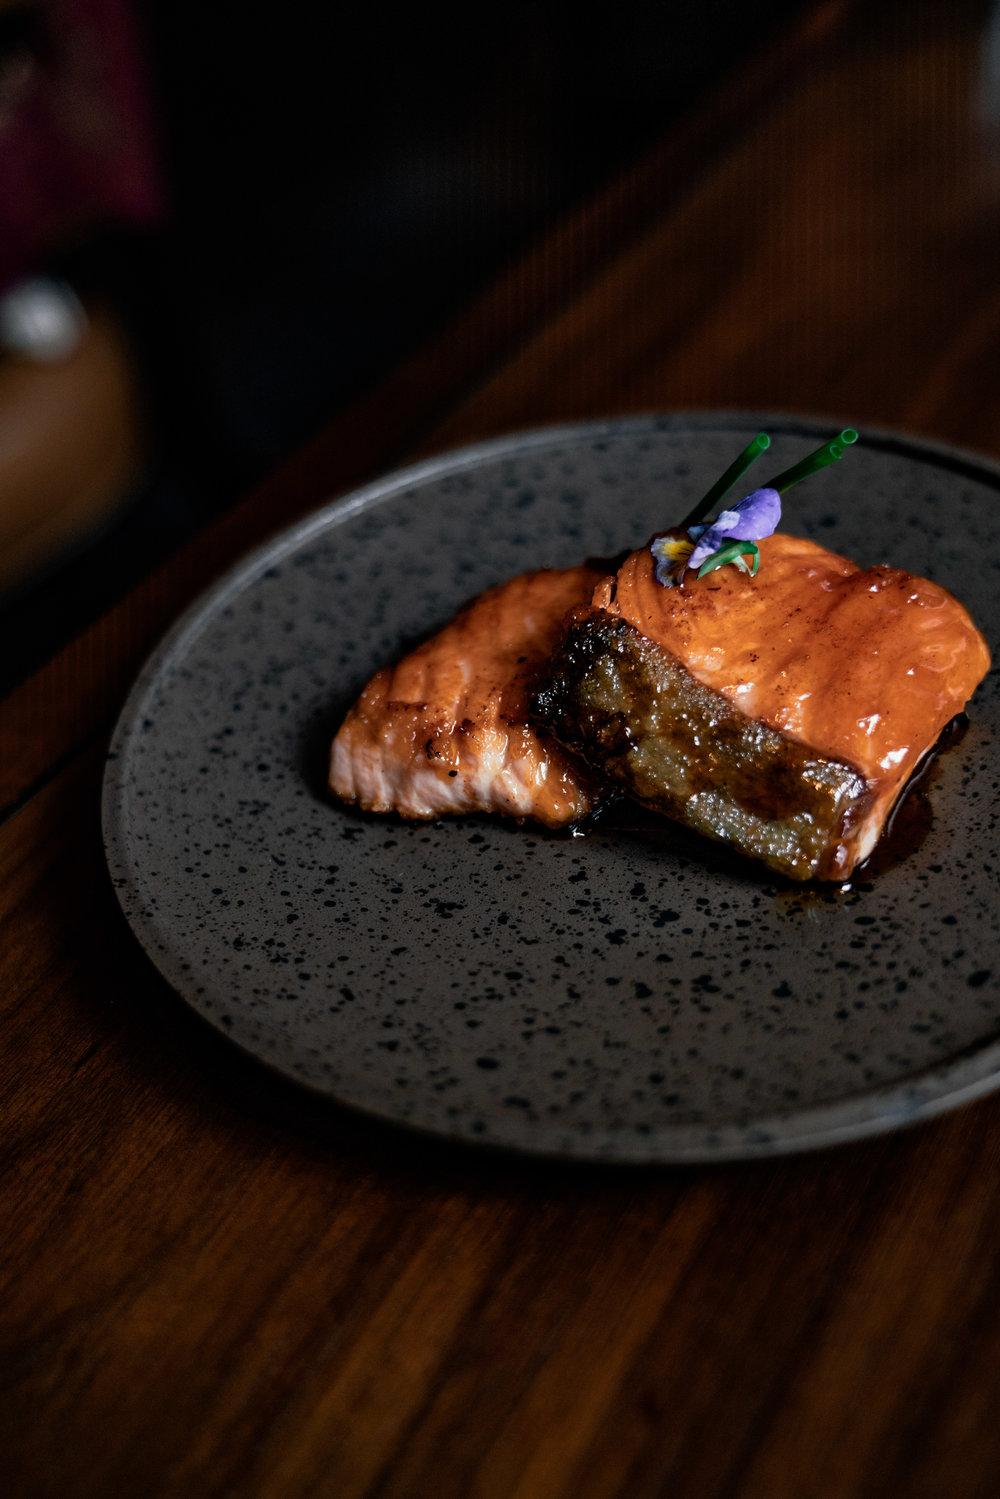 Pan fried fillet of Norwegian salmon in yuzu teriyaki sauce